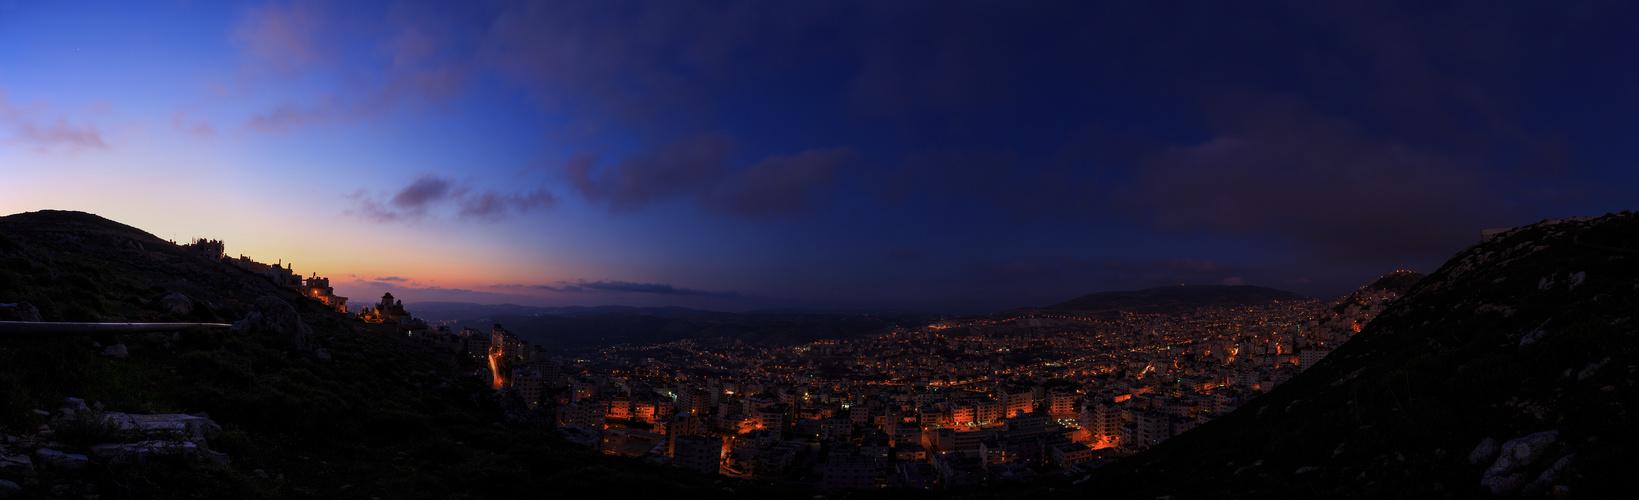 Nablus at Night